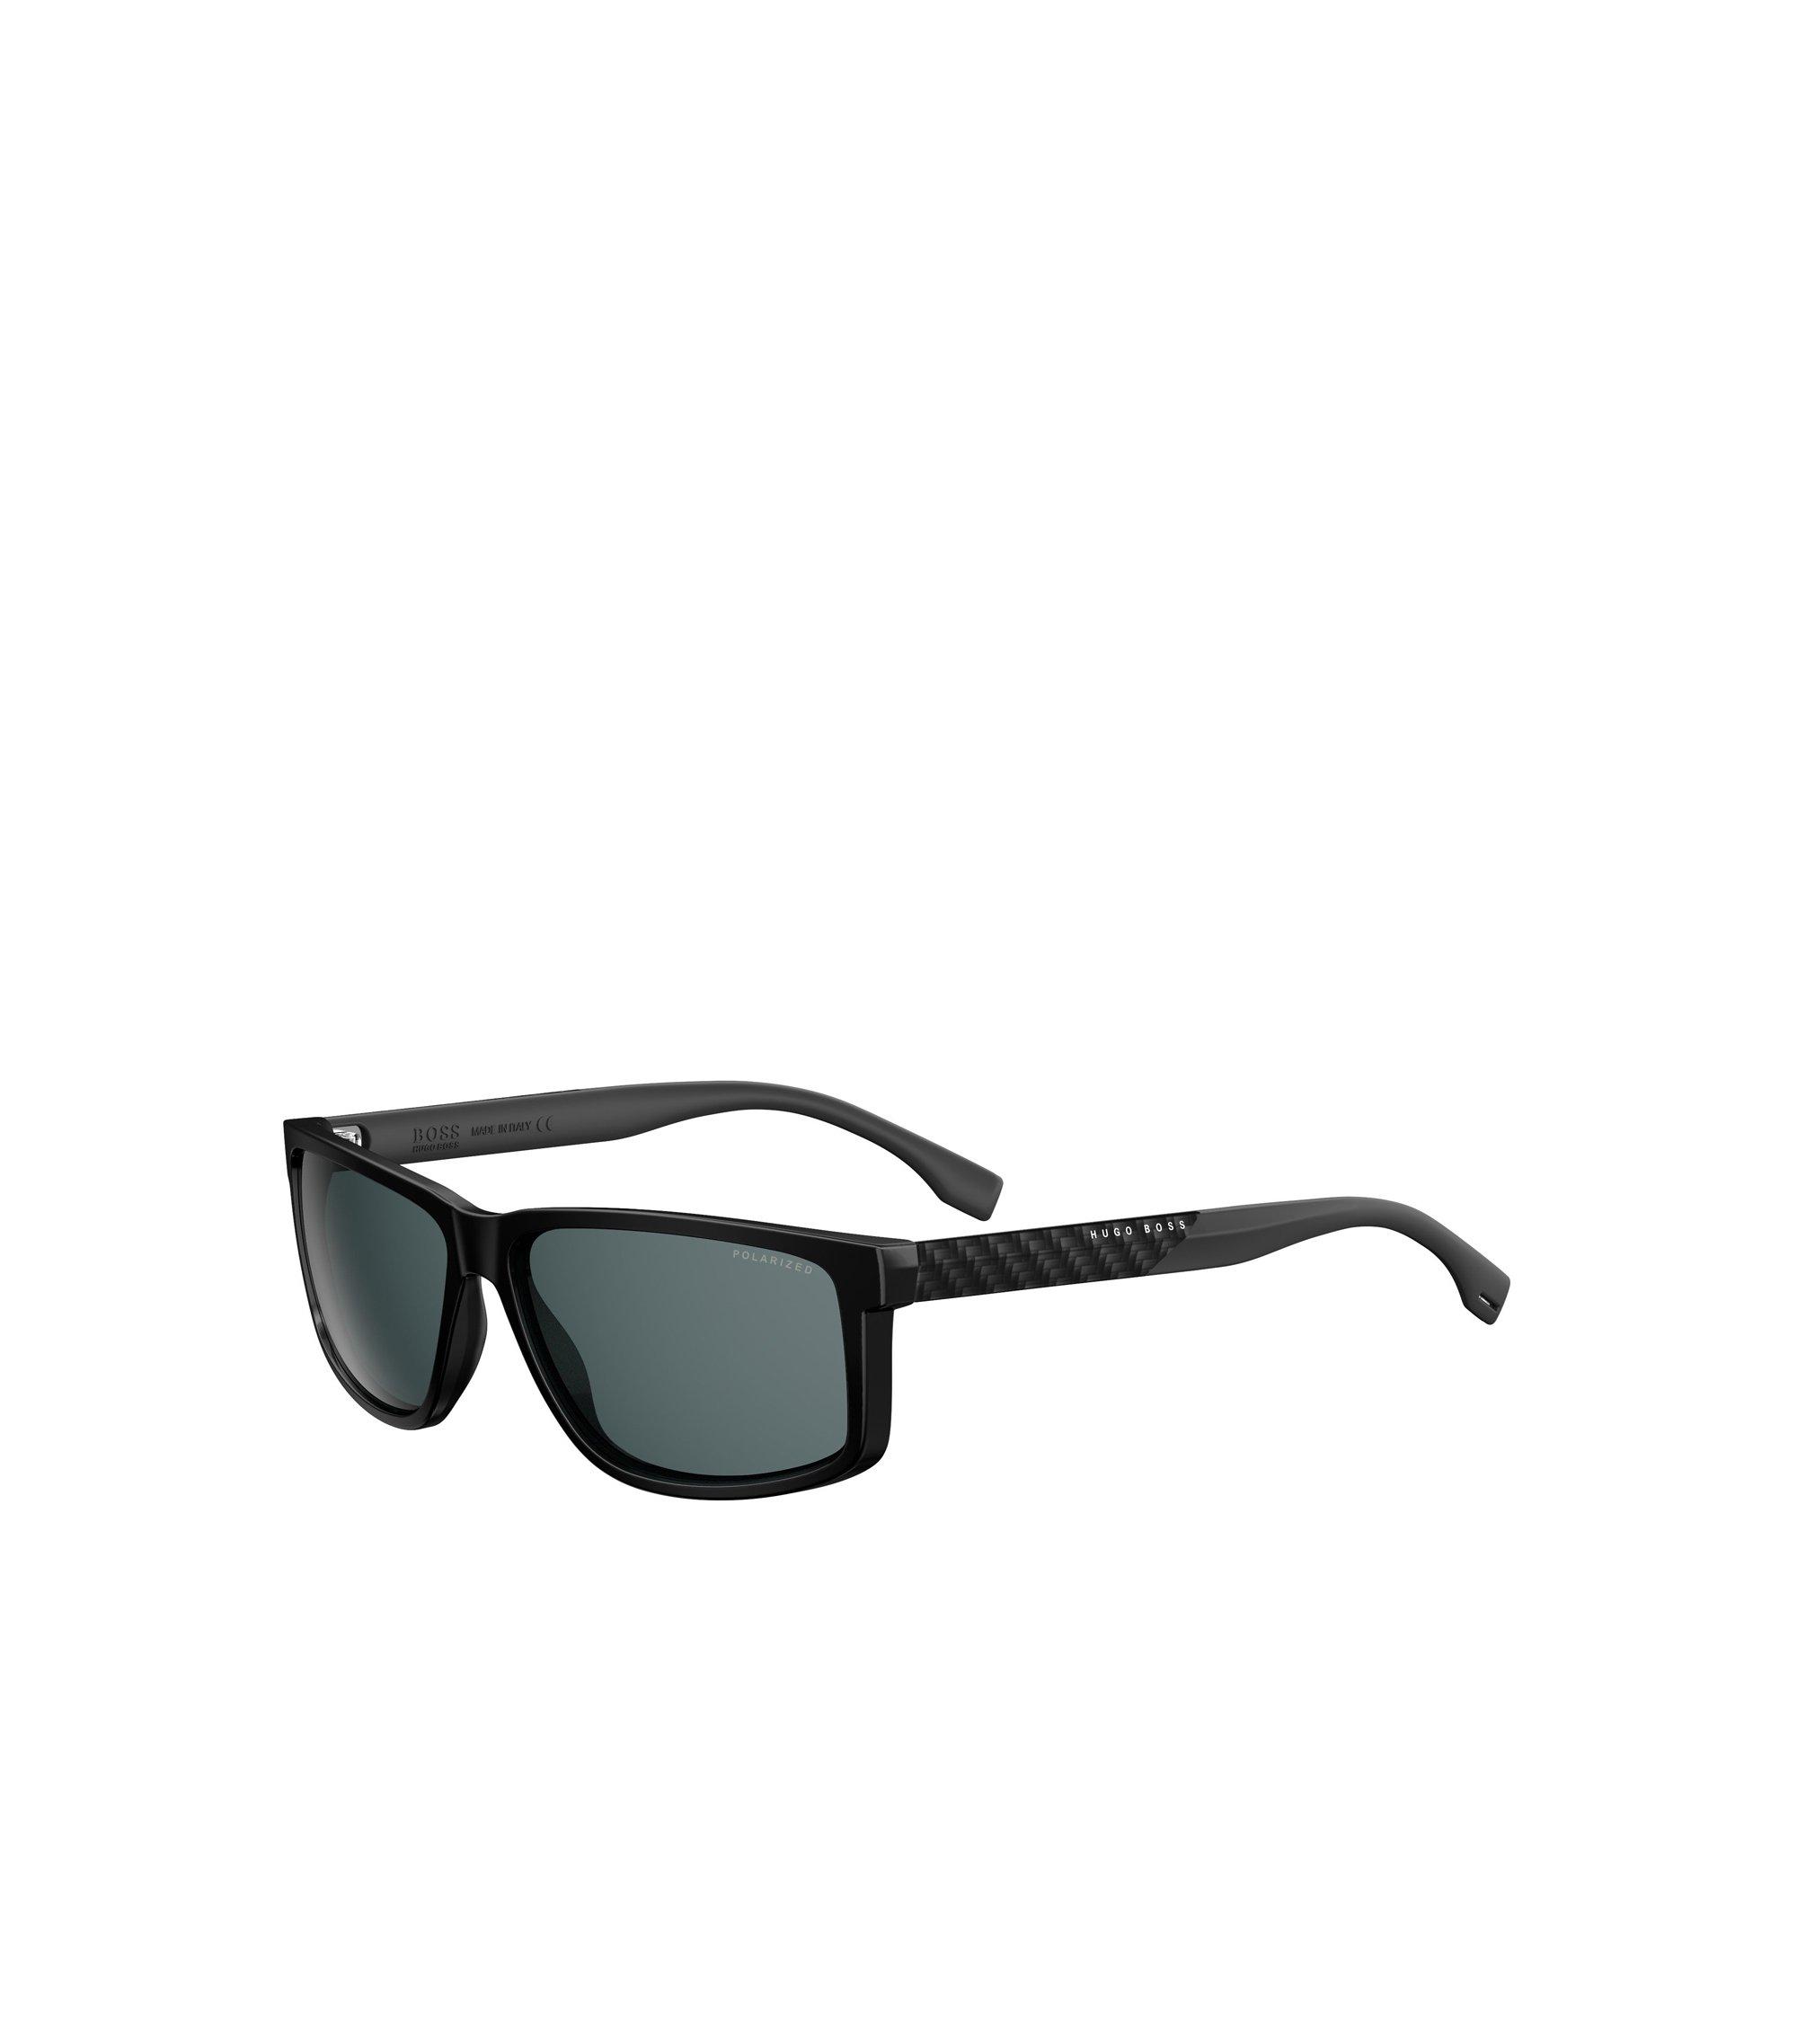 Dark Grey Carbon Fiber Rectangular Sunglasses   BOSS 0879, Assorted-Pre-Pack